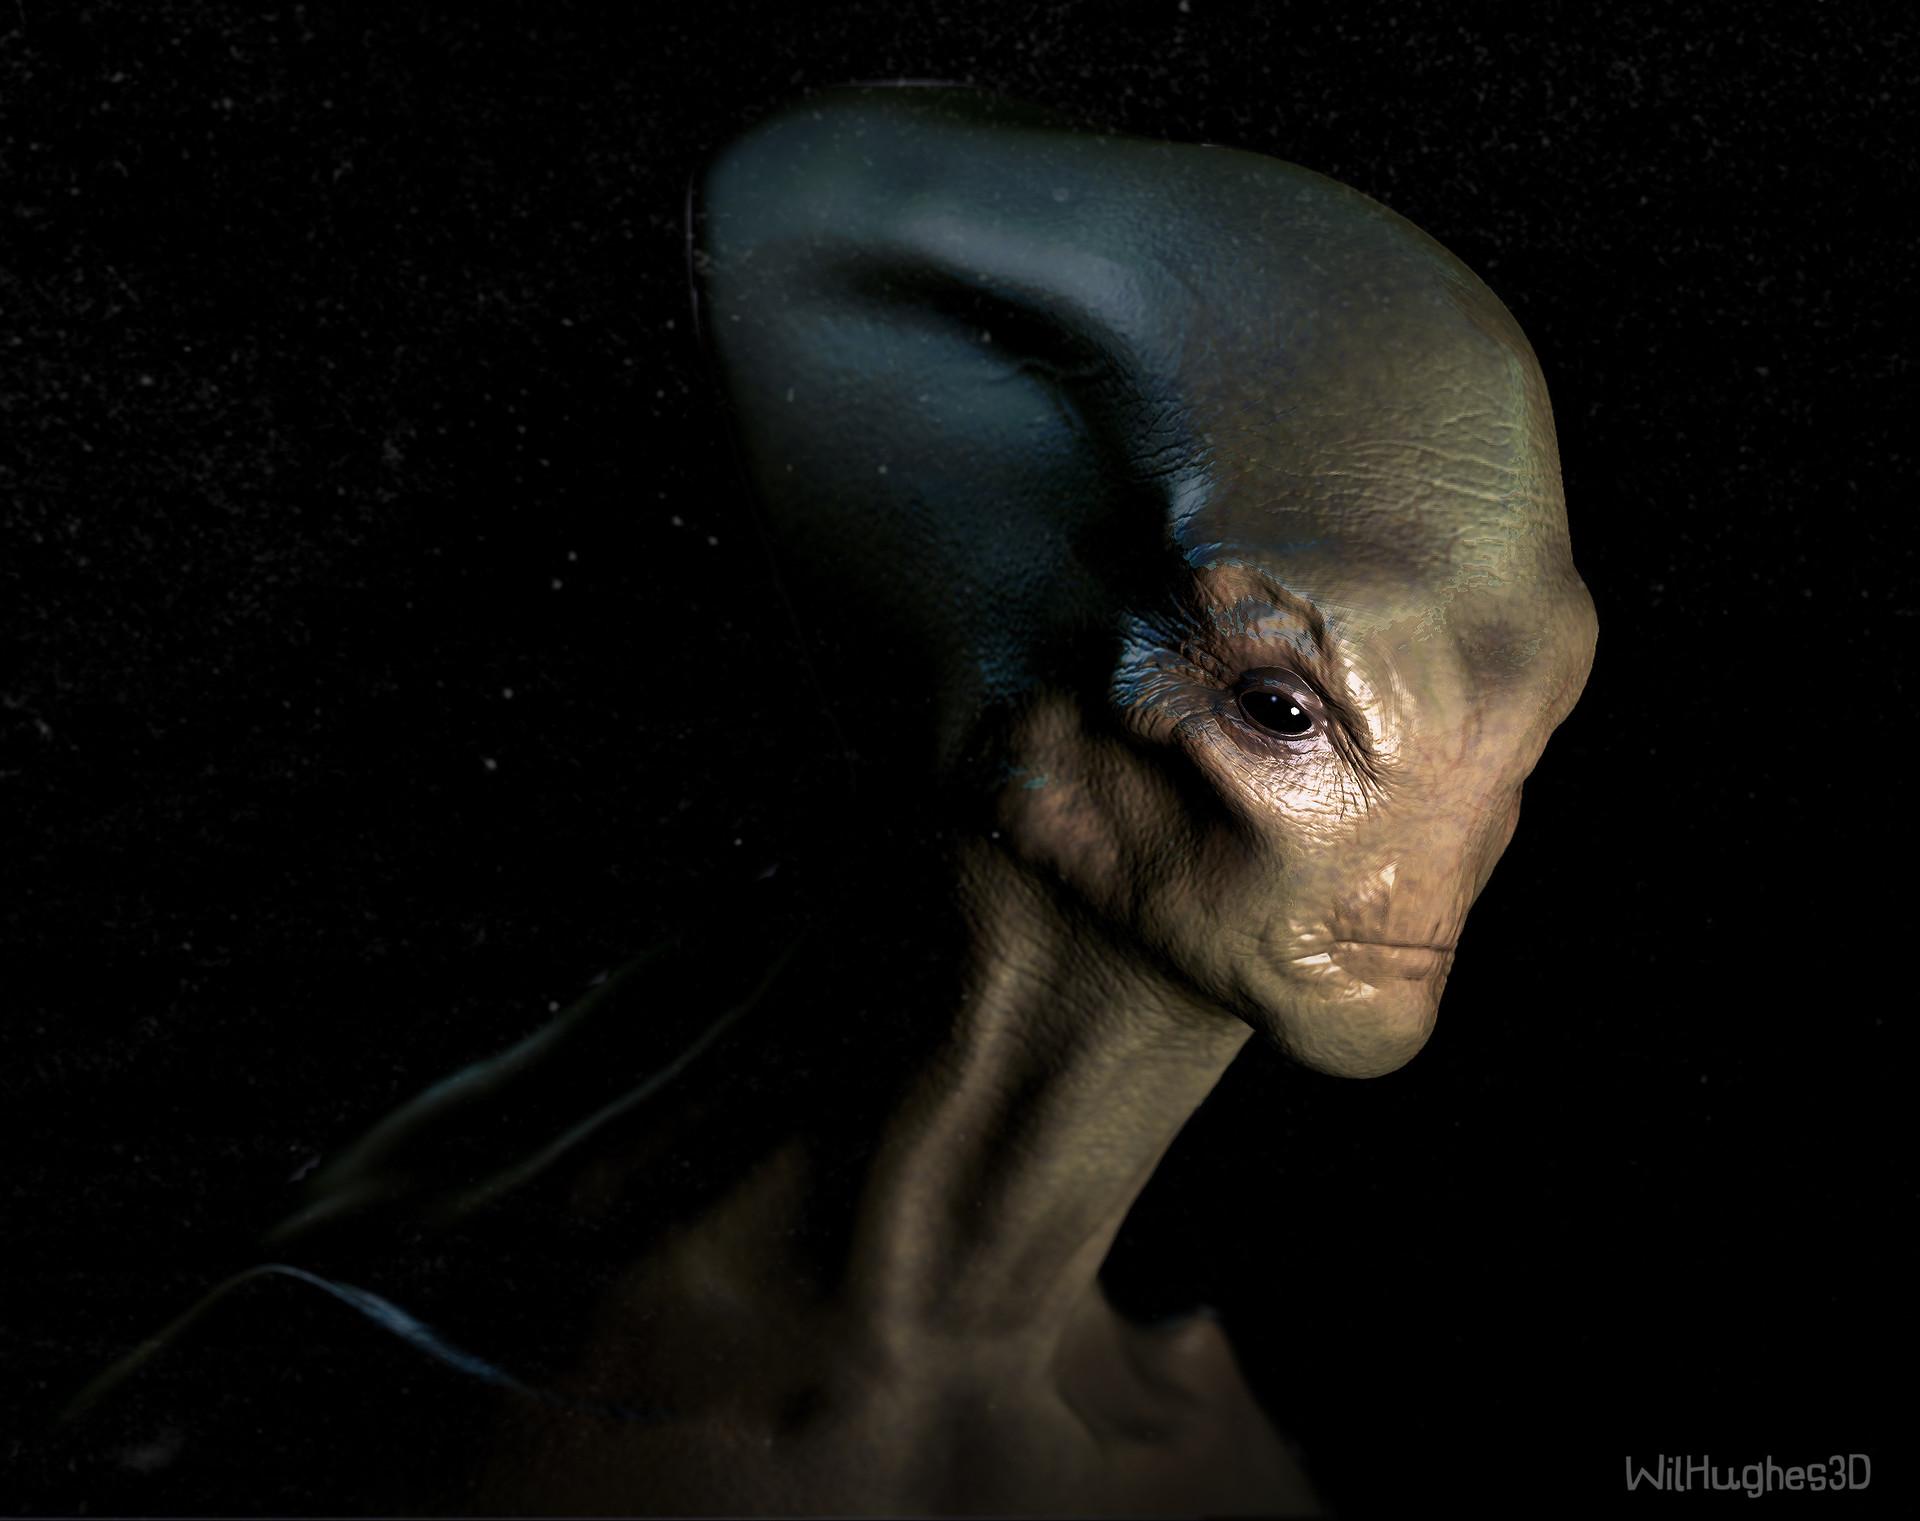 Wil hughes james alien